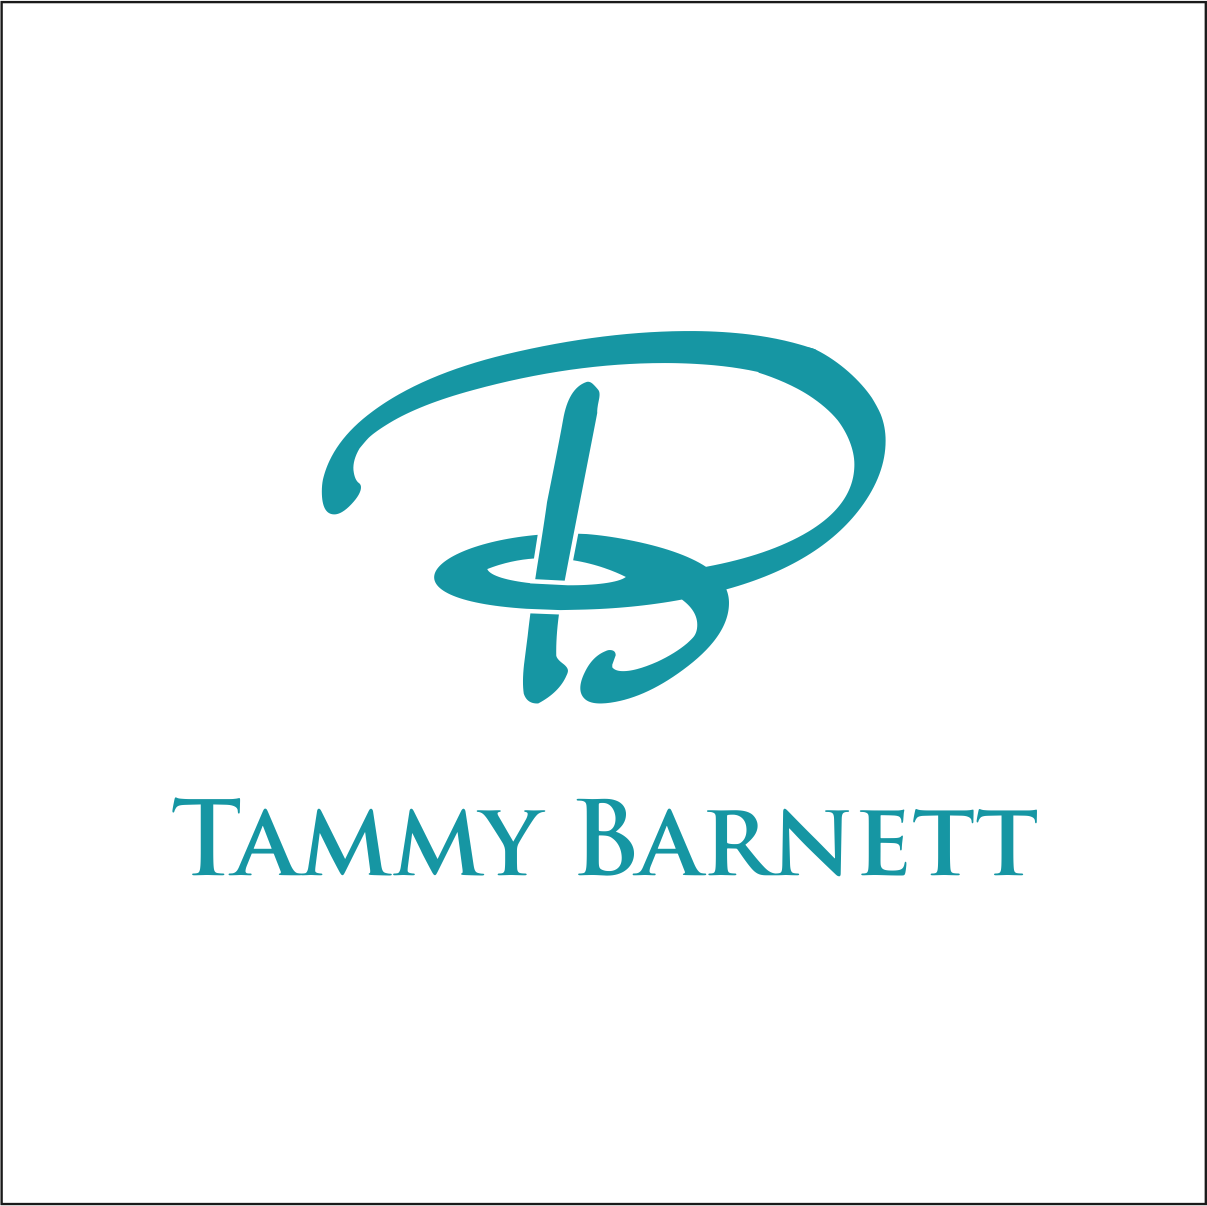 Playful, Professional, Lawyer Logo Design for Tammy Barnett by myusf